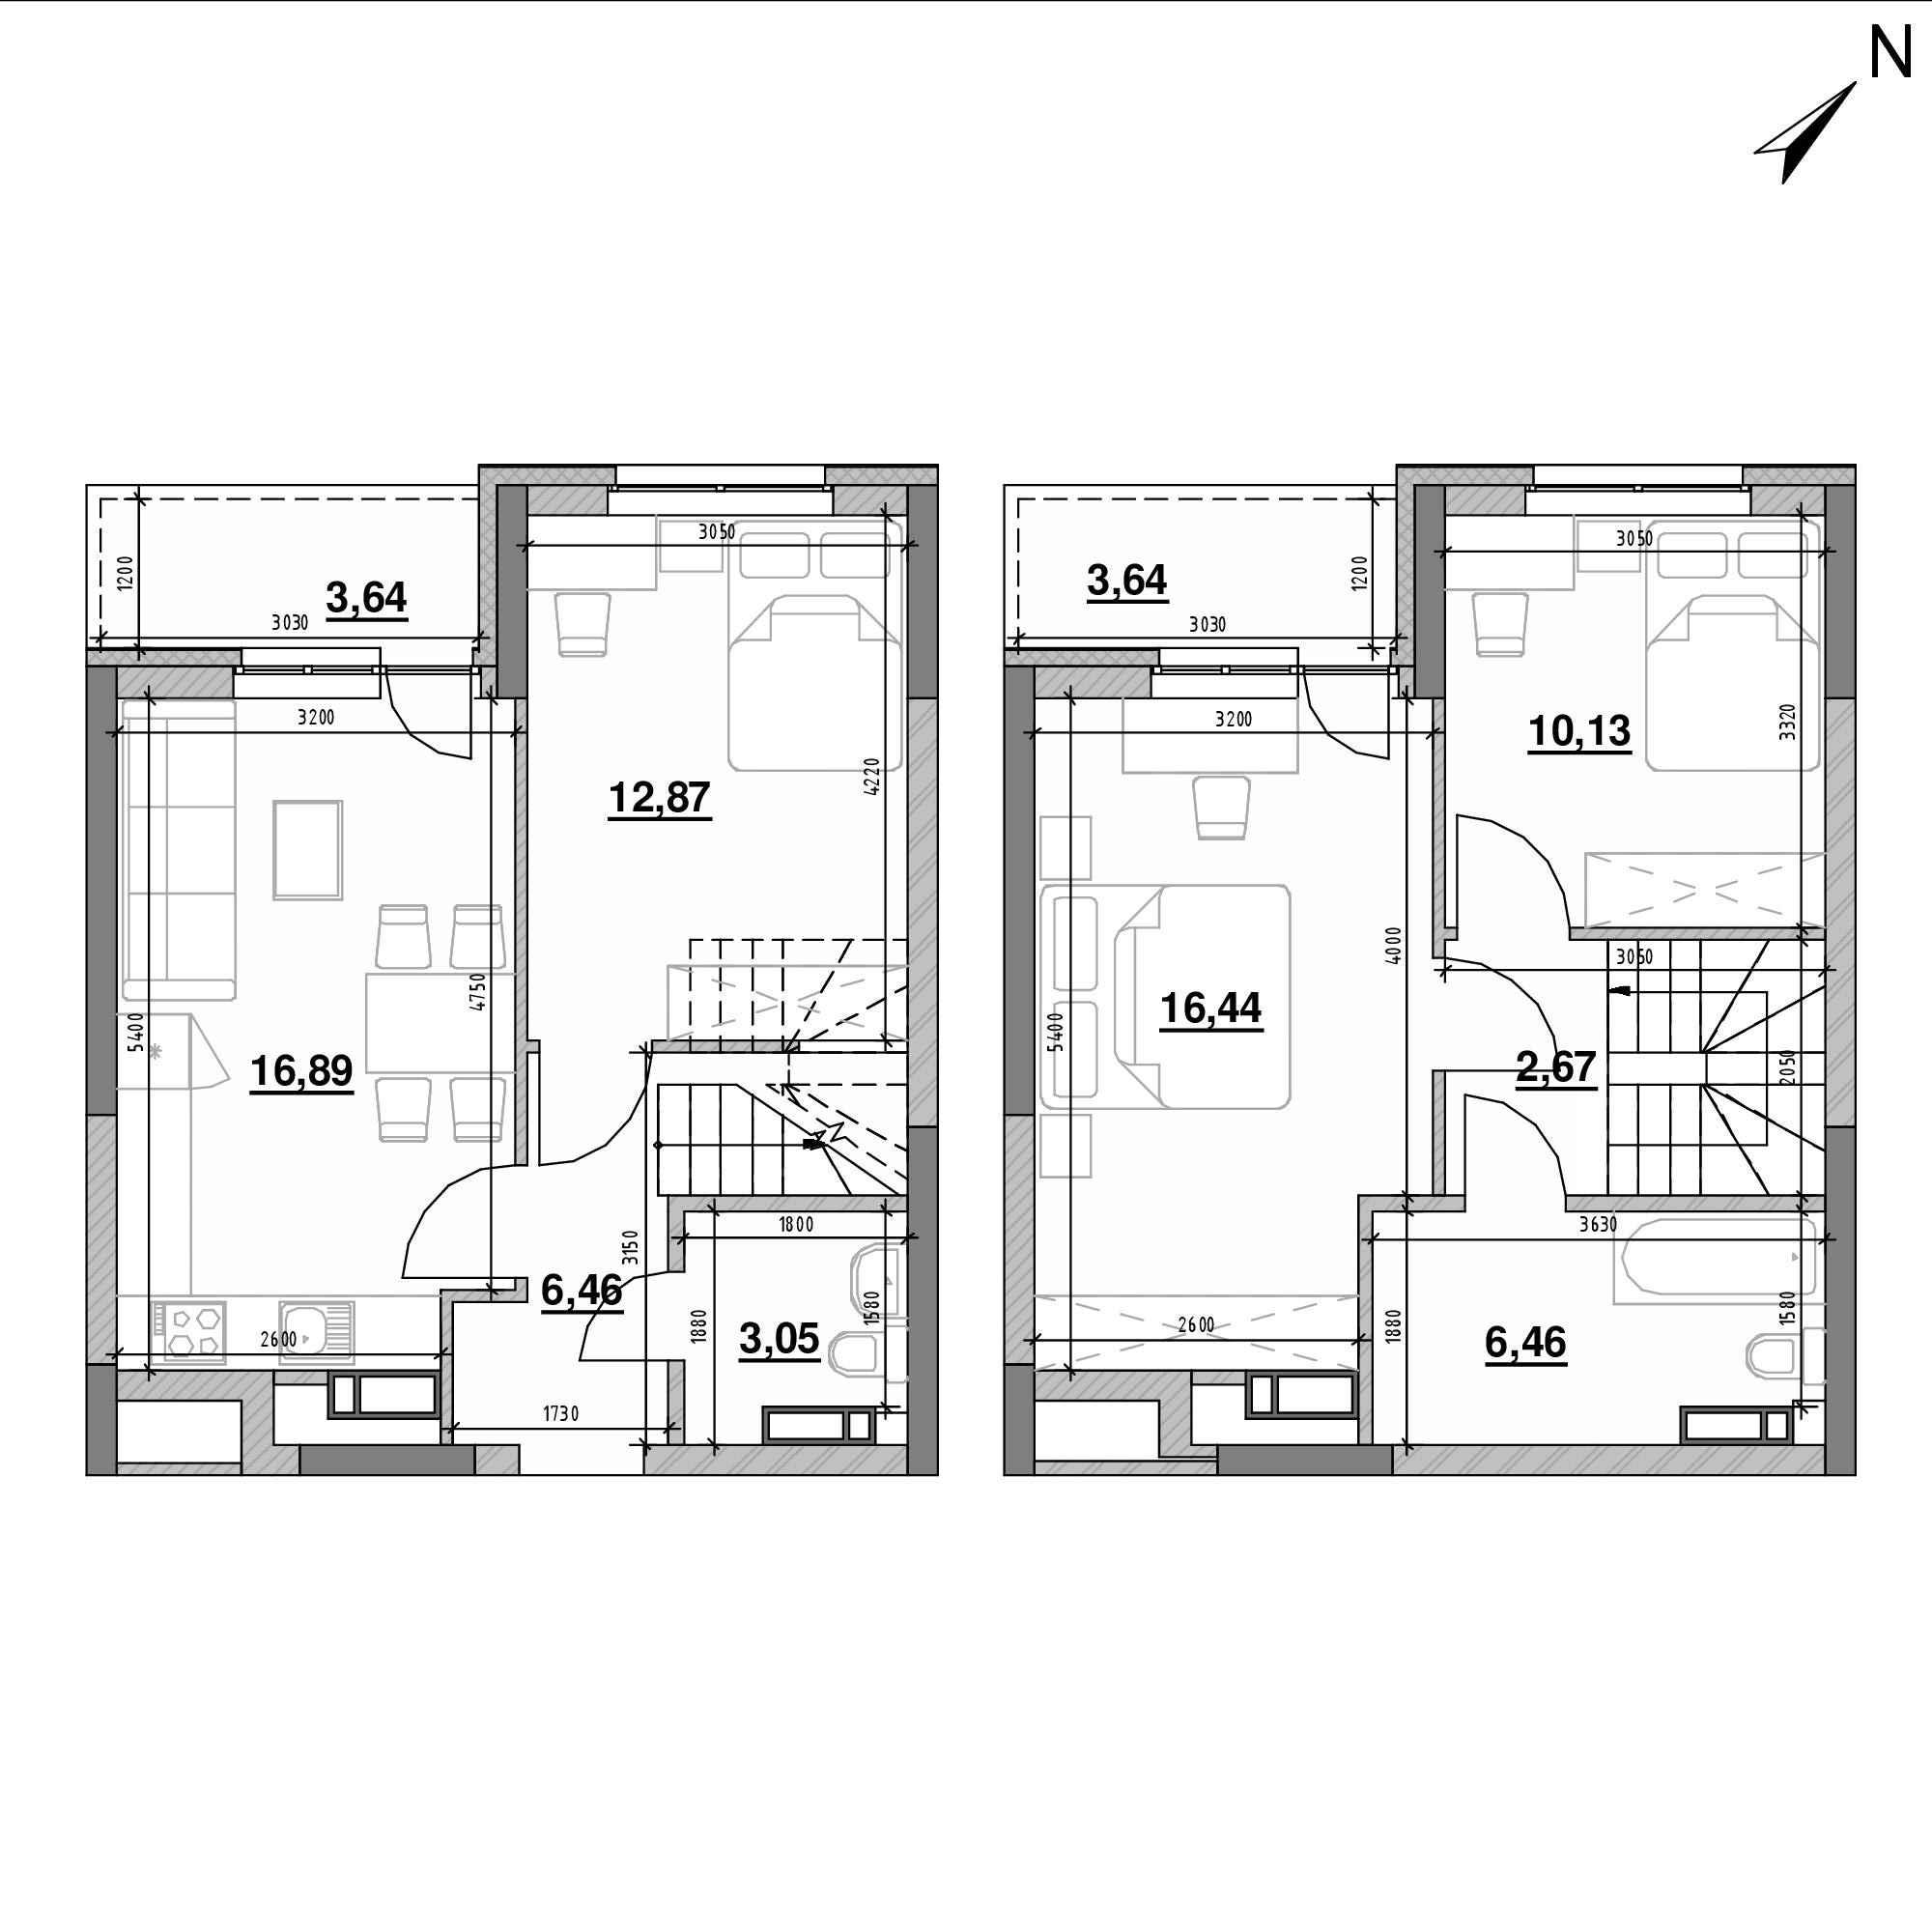 ЖК Оk'Land: планування 3-кімнатної квартири, №458, 82.25 м<sup>2</sup>